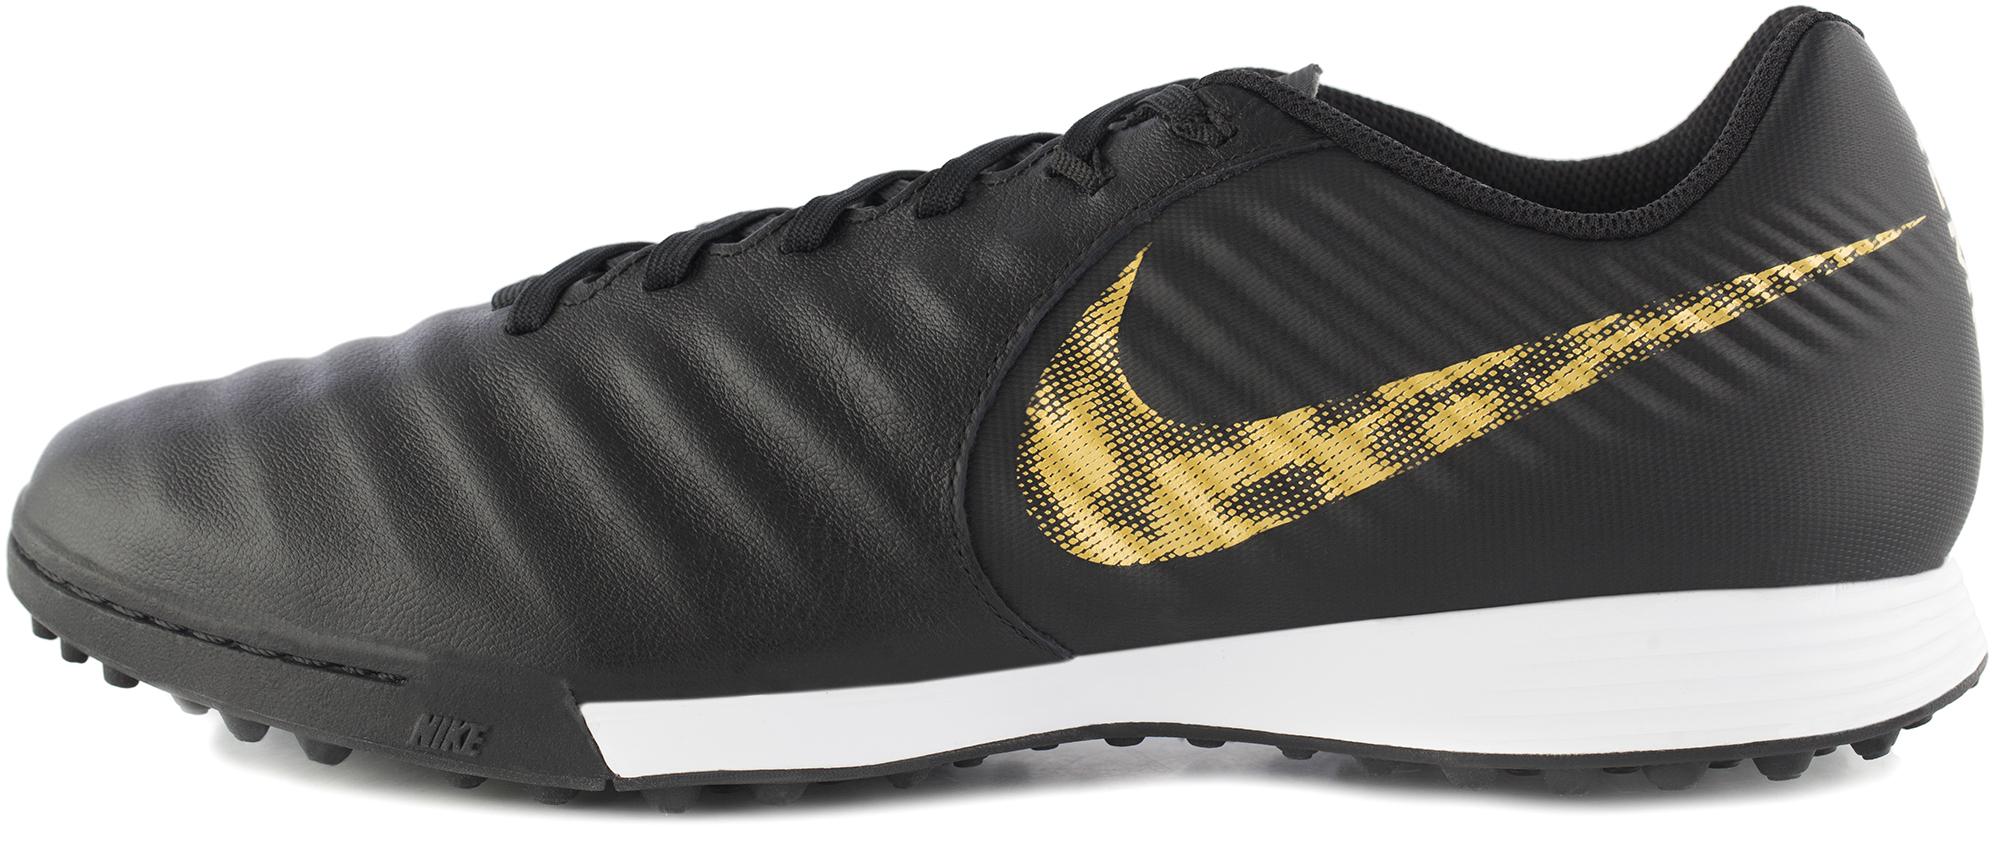 Nike Бутсы мужские Nike Tiempo Legend 7 Academy TF, размер 41,5 цена 2017